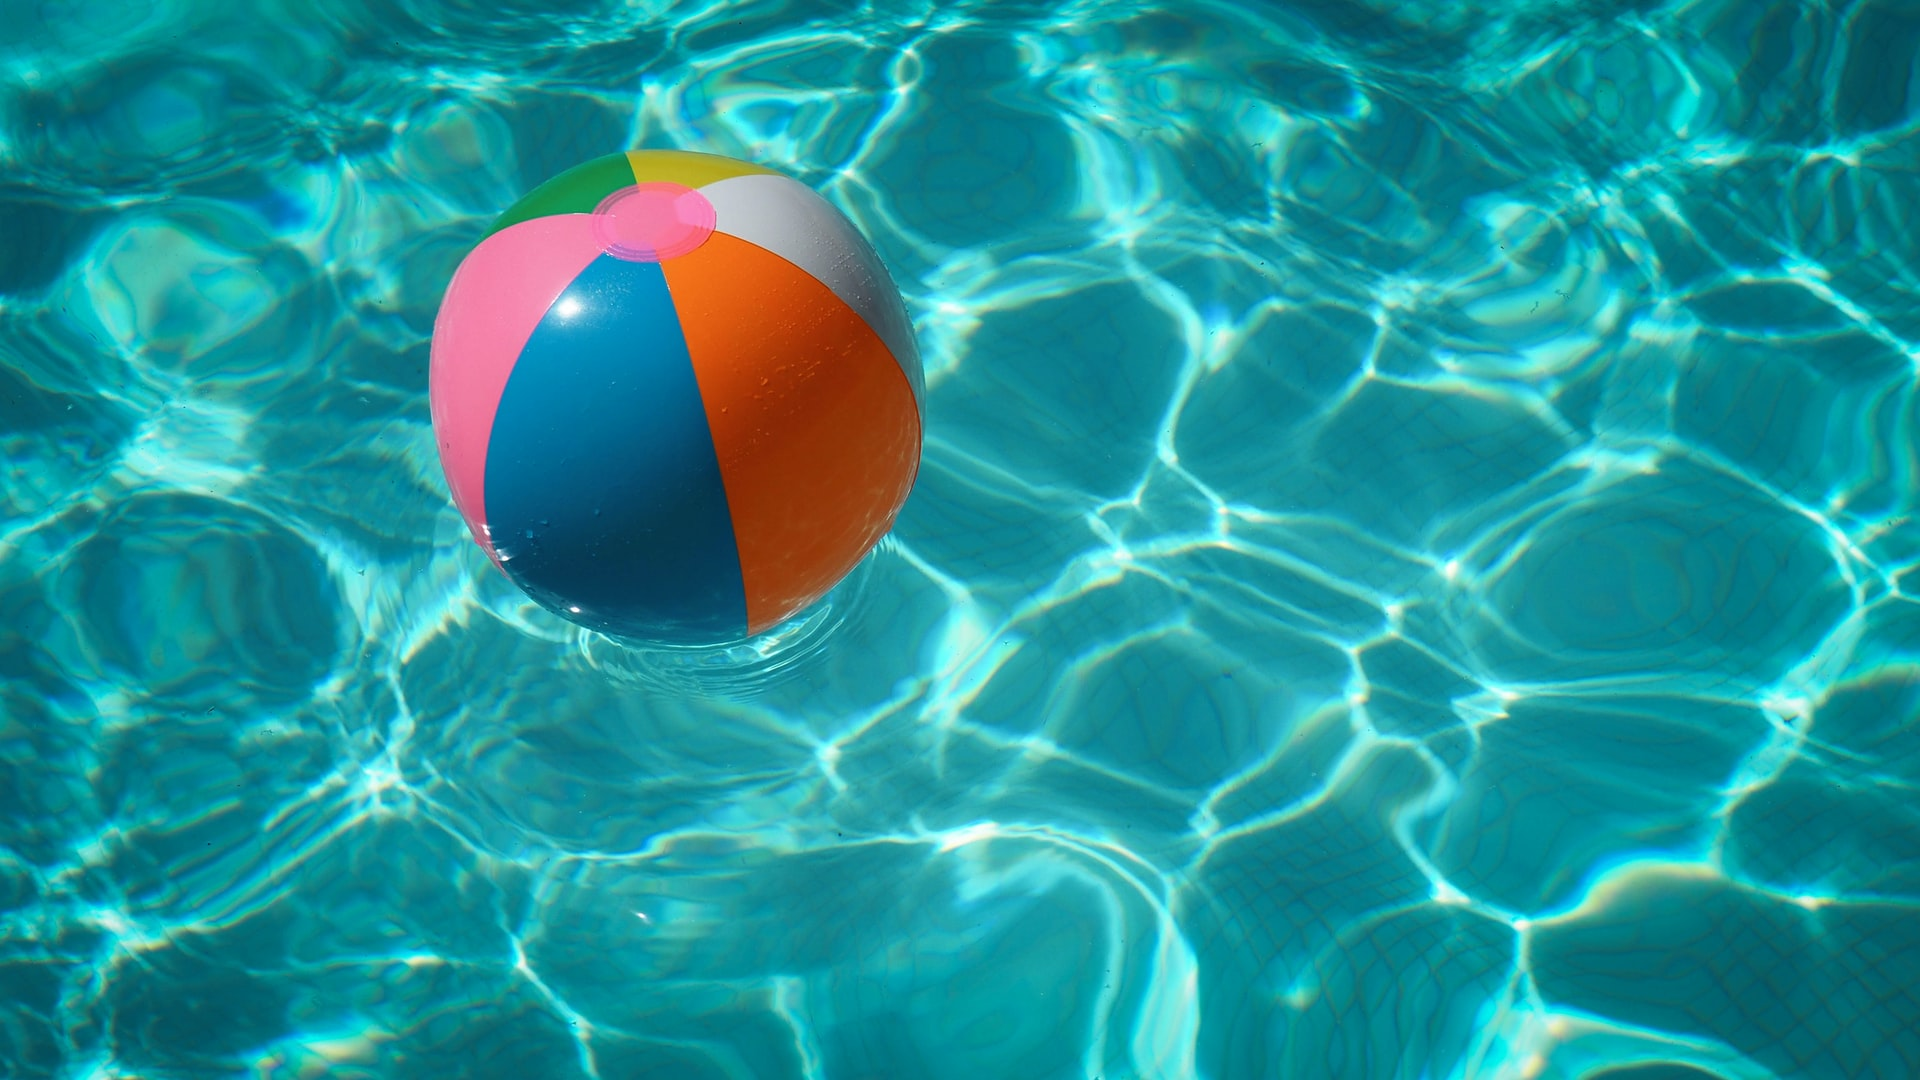 beach ball in pool